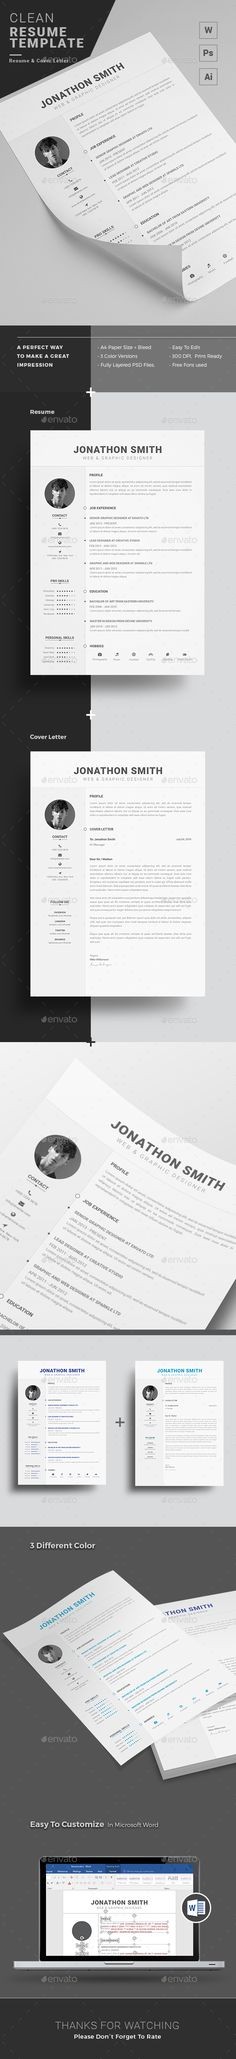 Resume Pinterest Ai illustrator